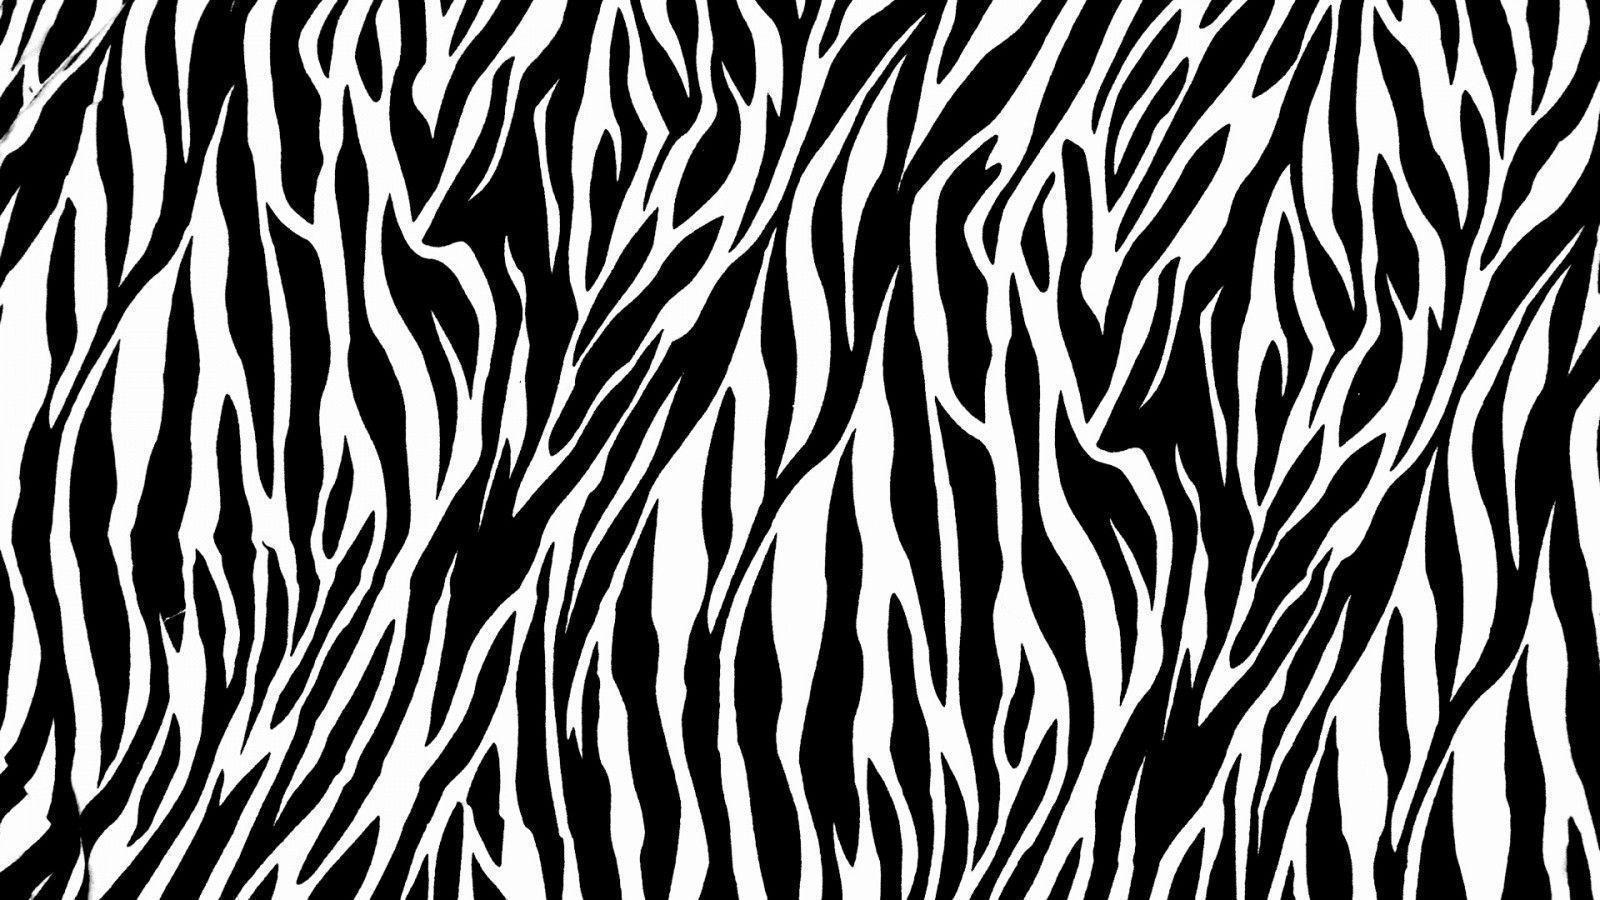 Zebra desktop wallpapers wallpaper cave for Zebra print wallpaper